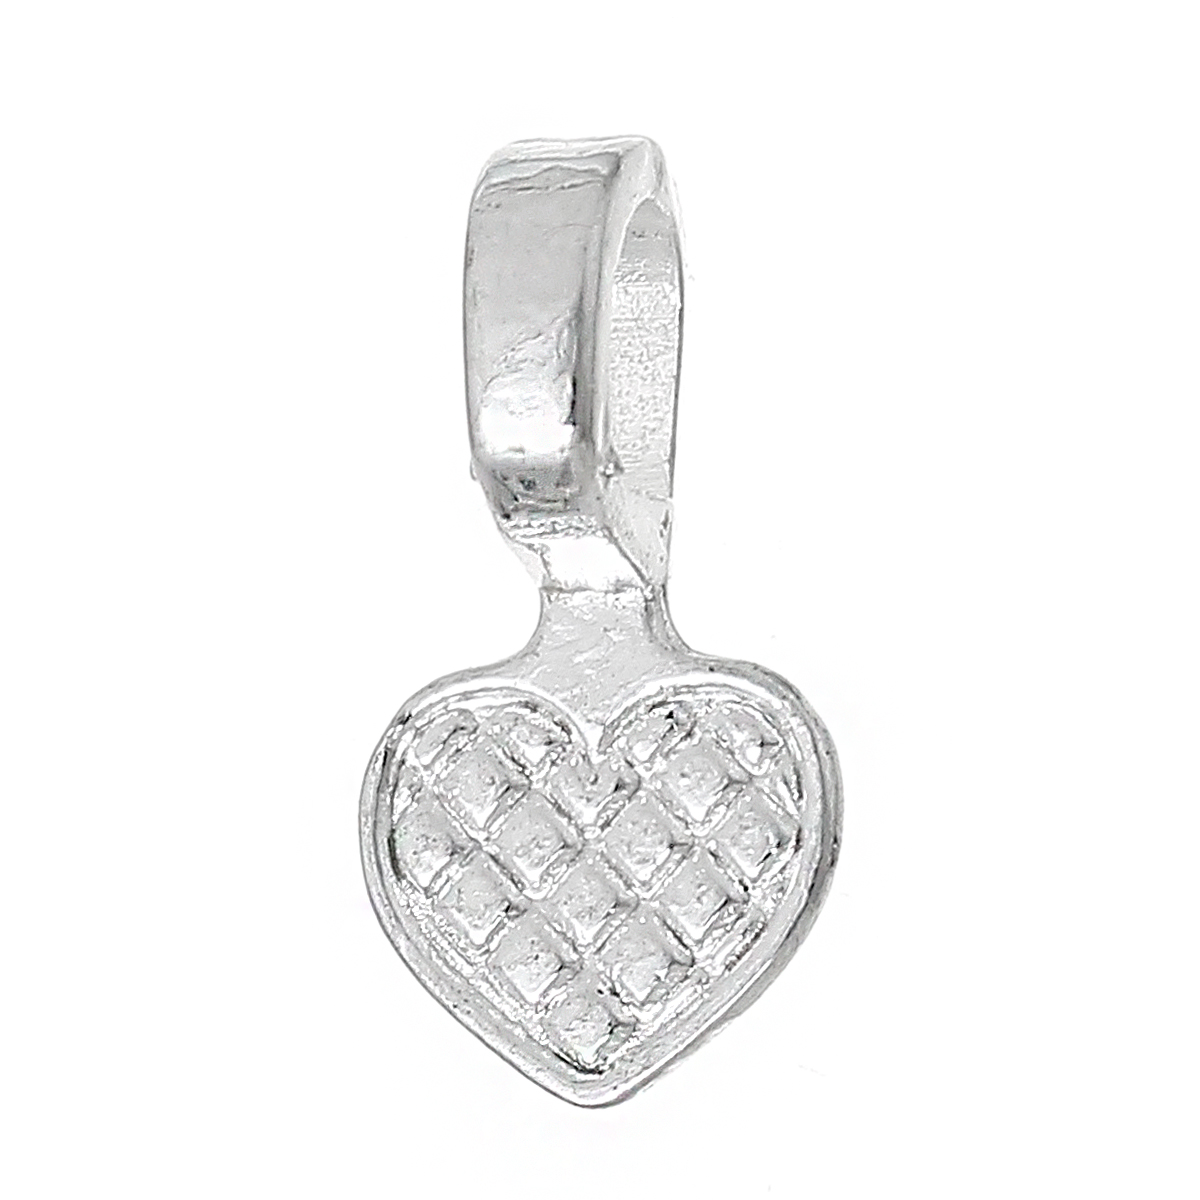 doreenbeads-glue-on-bail-charm-heart-silver-color-168mm-5-8-x-80mm-fontb3-b-font-8200-pcs-2015-new